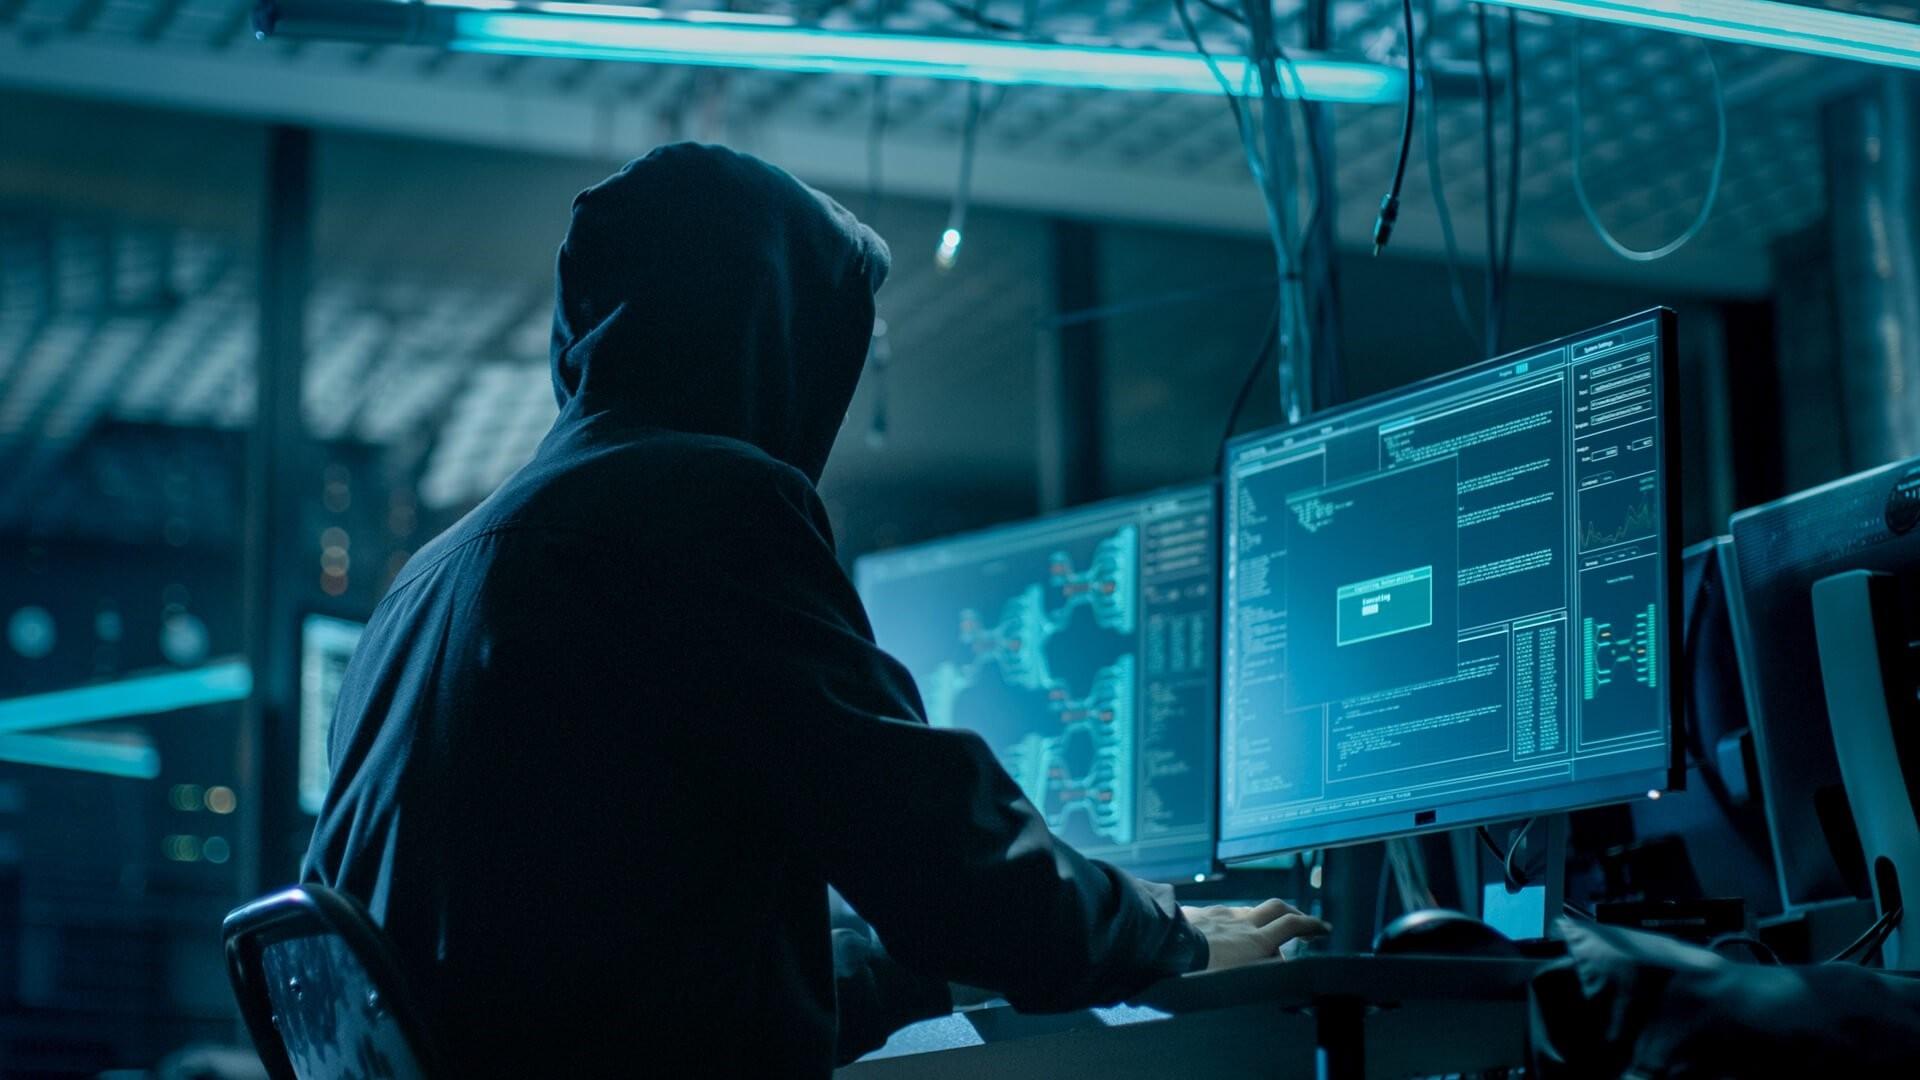 Hacker Background Wallpaper